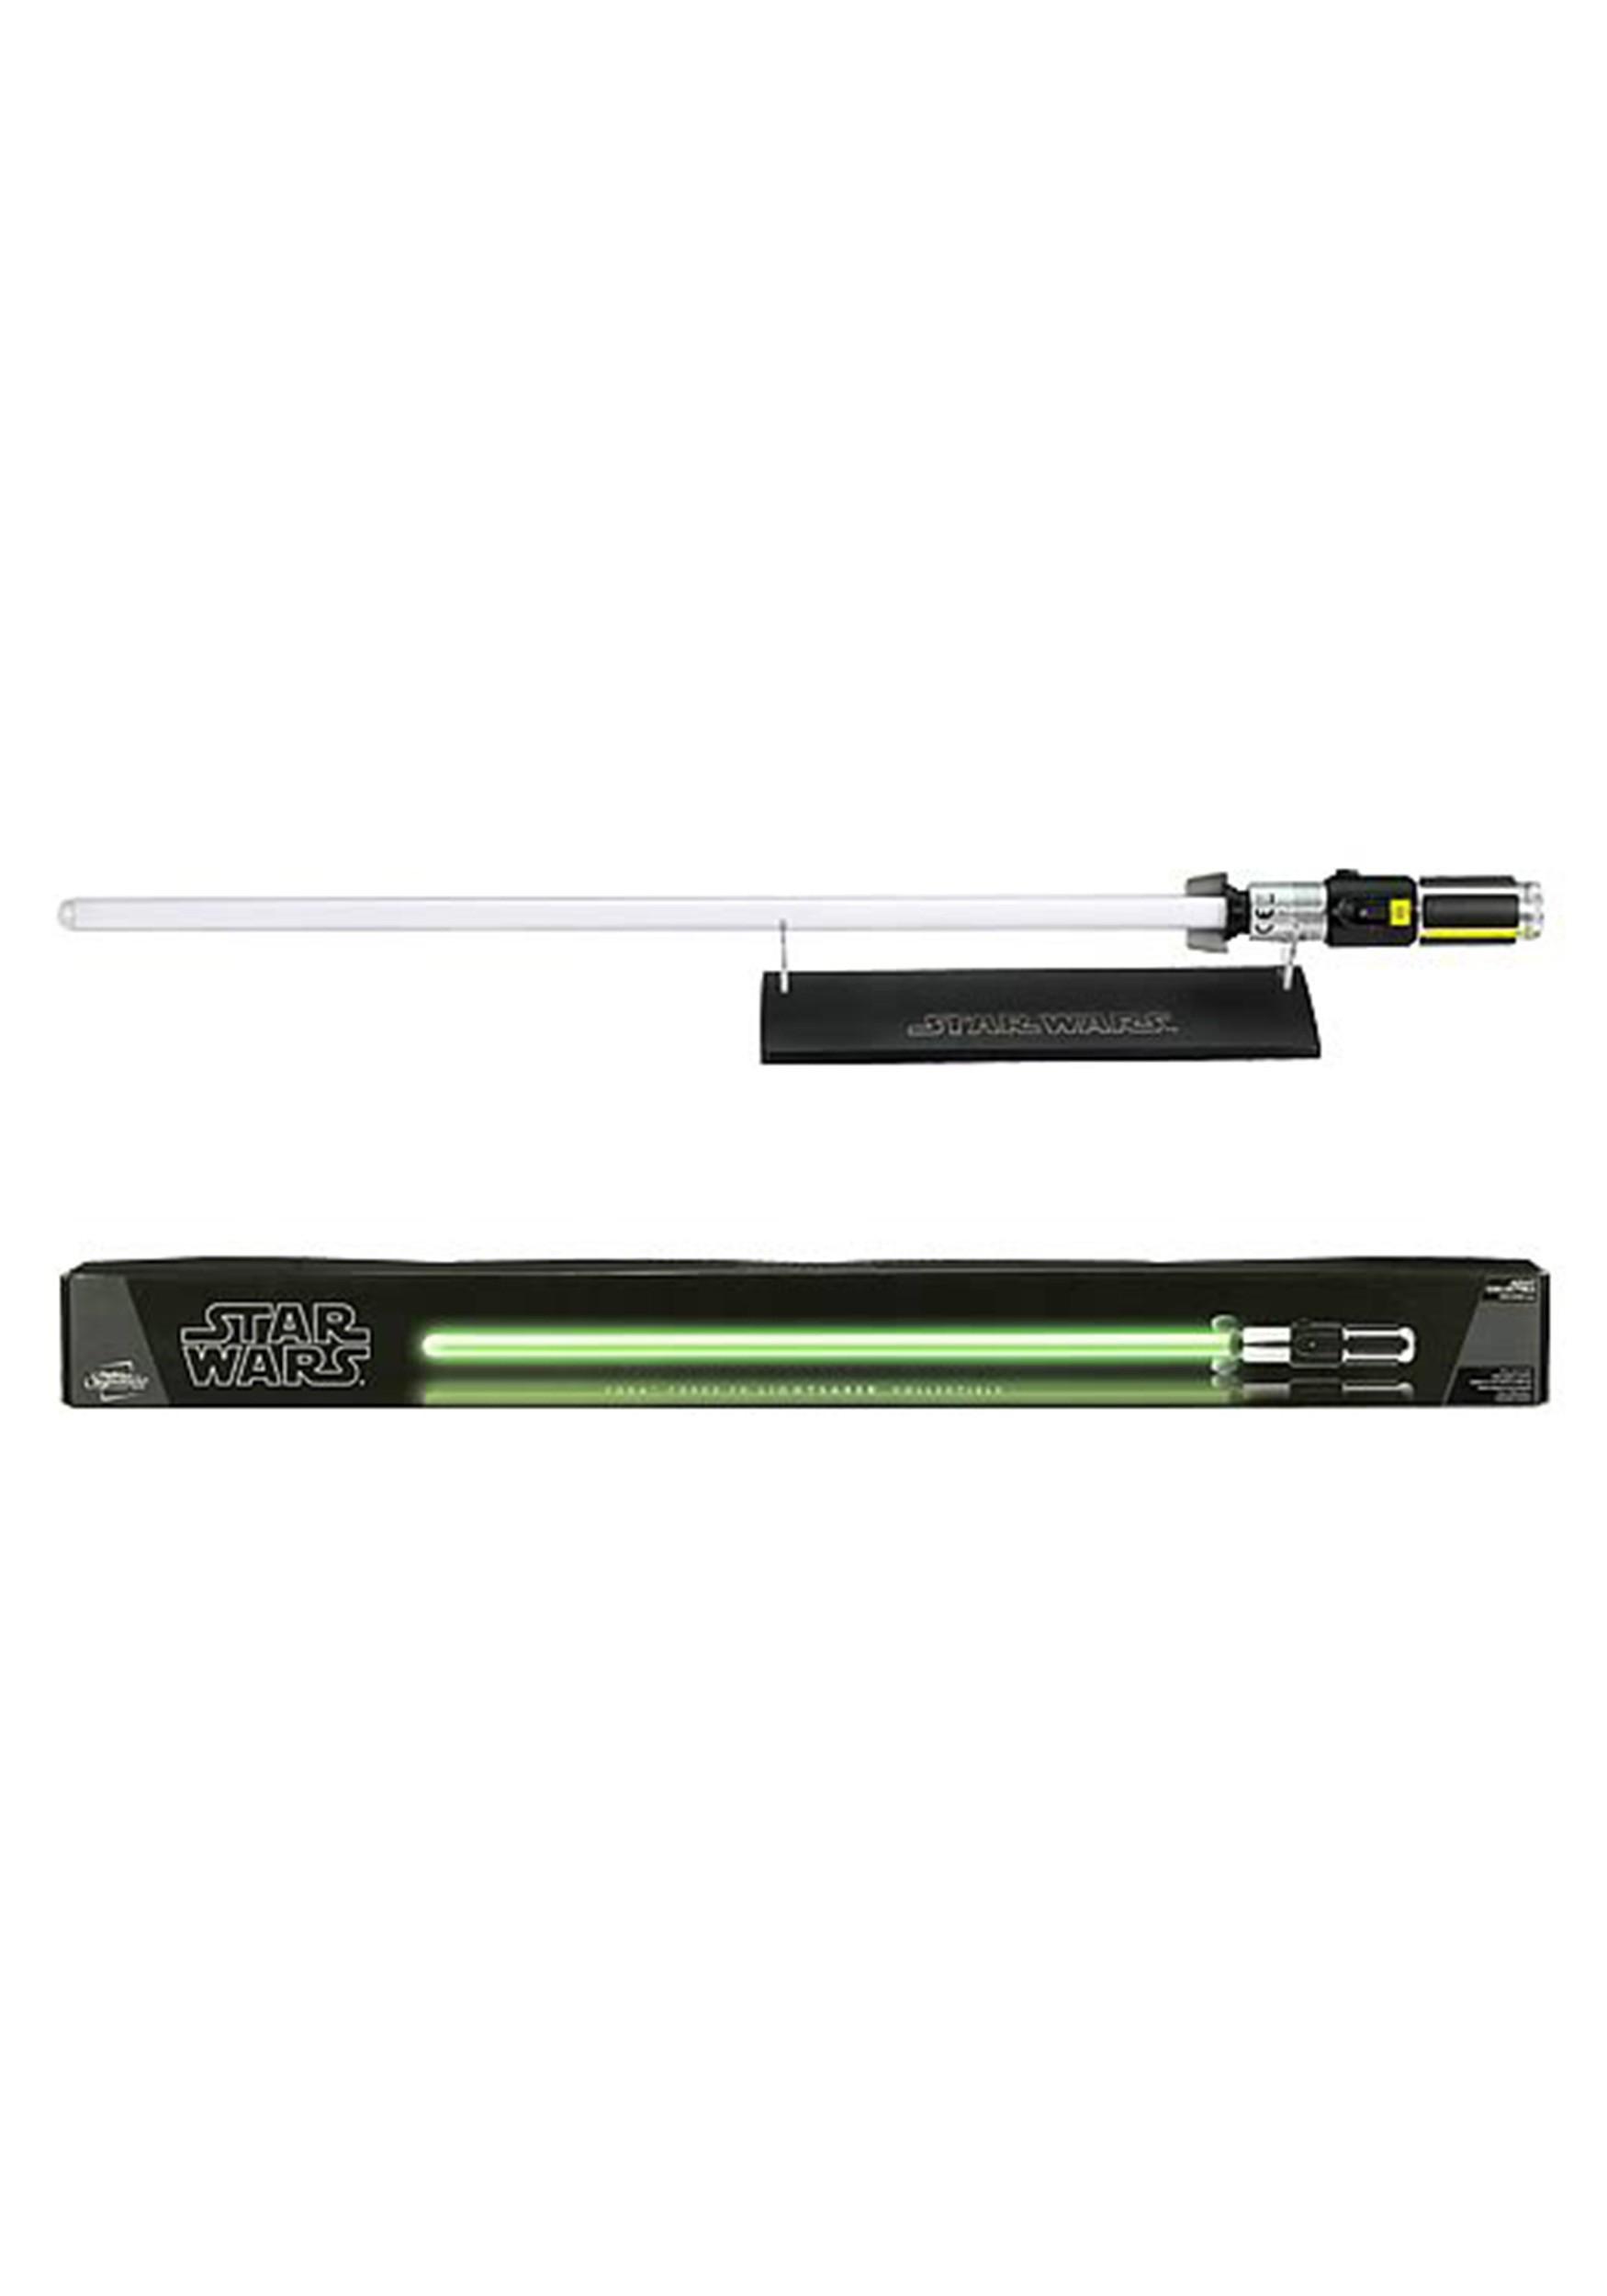 Star Wars Force FX Yoda Lightsaber Replica